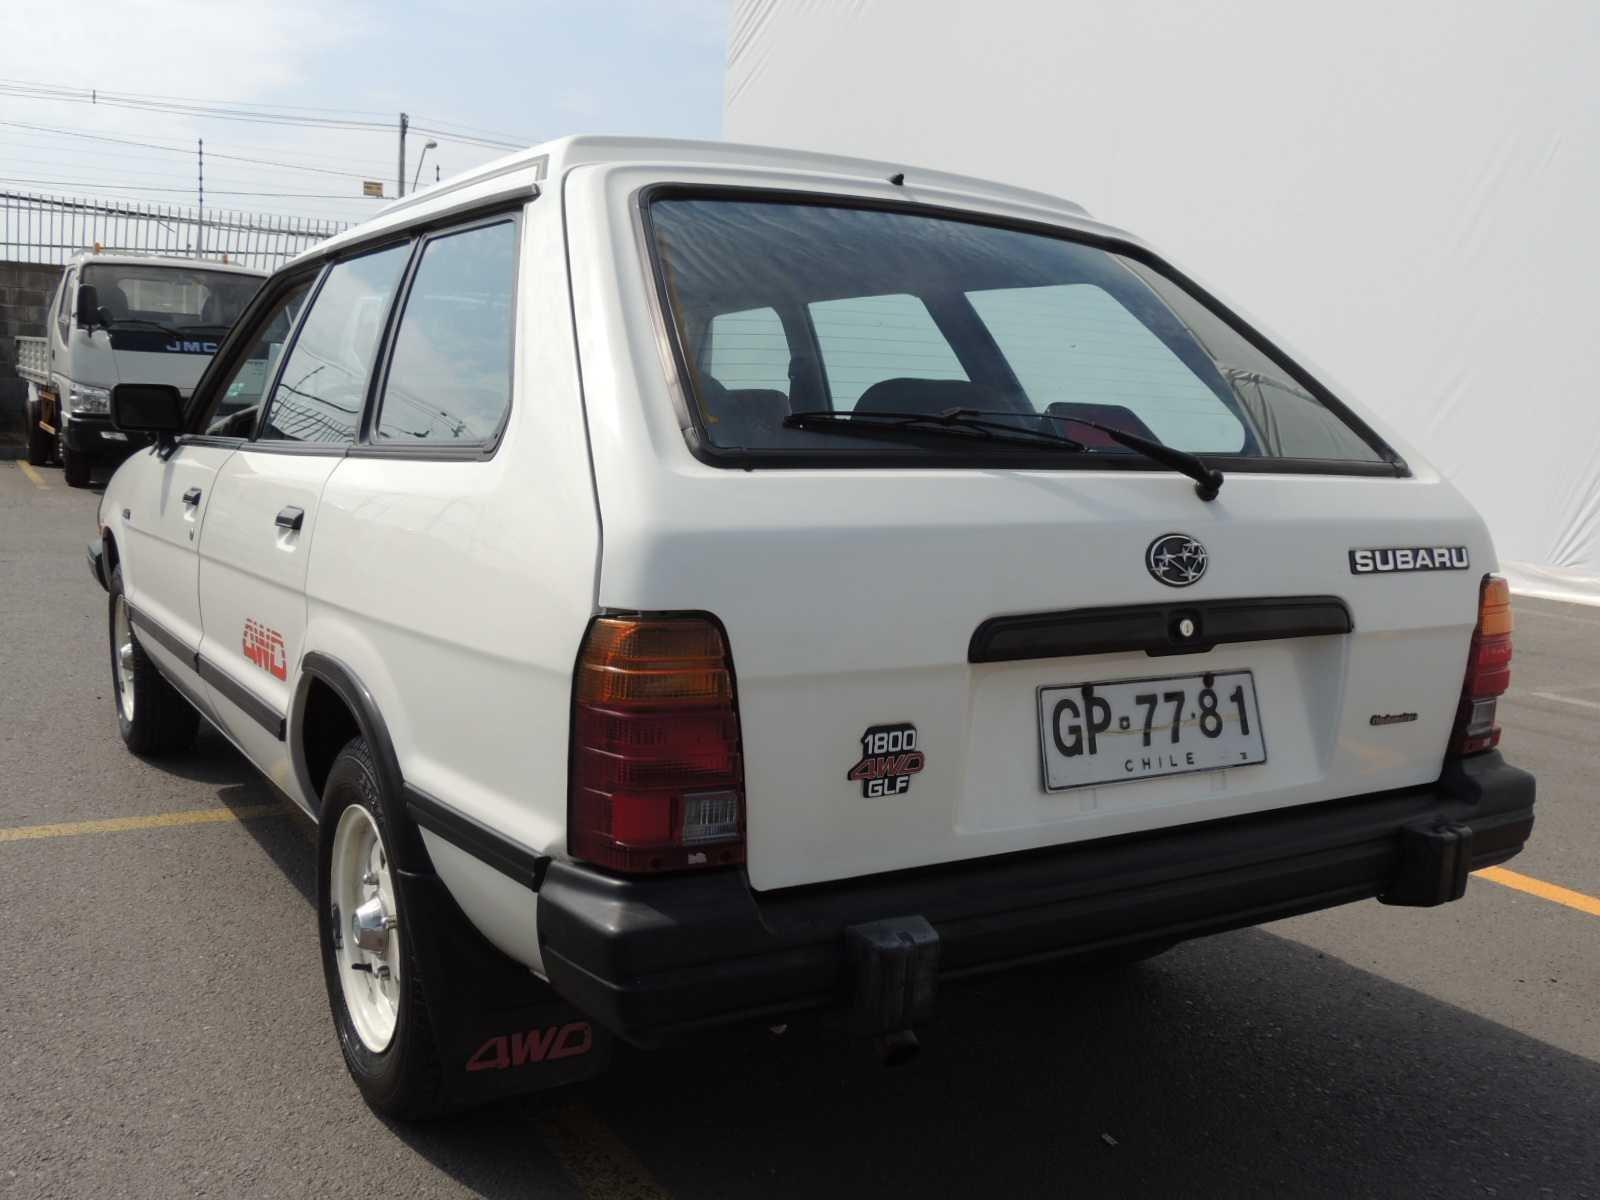 Subaru 1800 GLF 4WD 1983 (27)